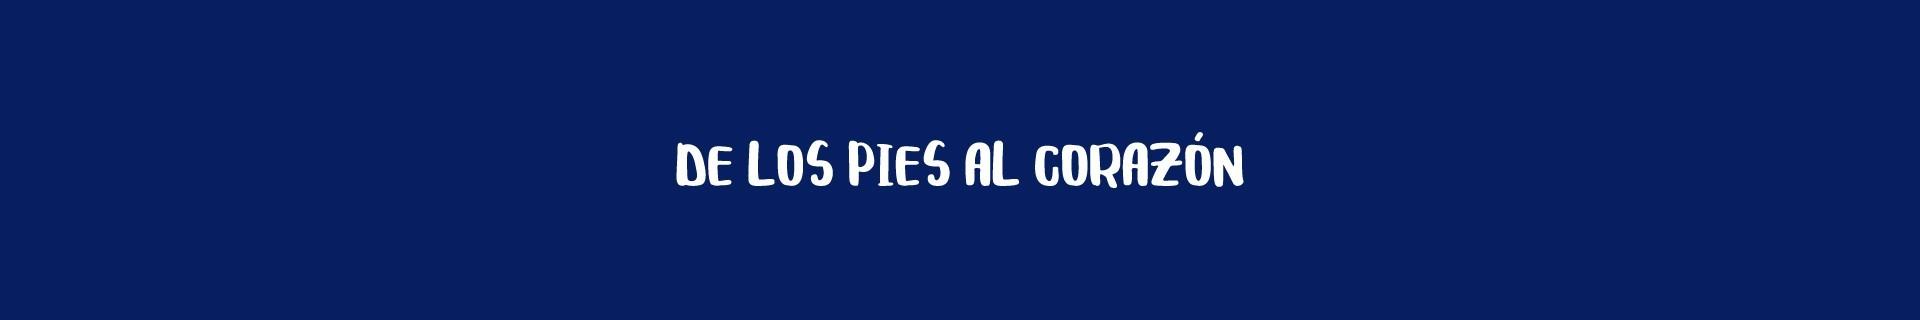 Calcetines de diferentes provincias